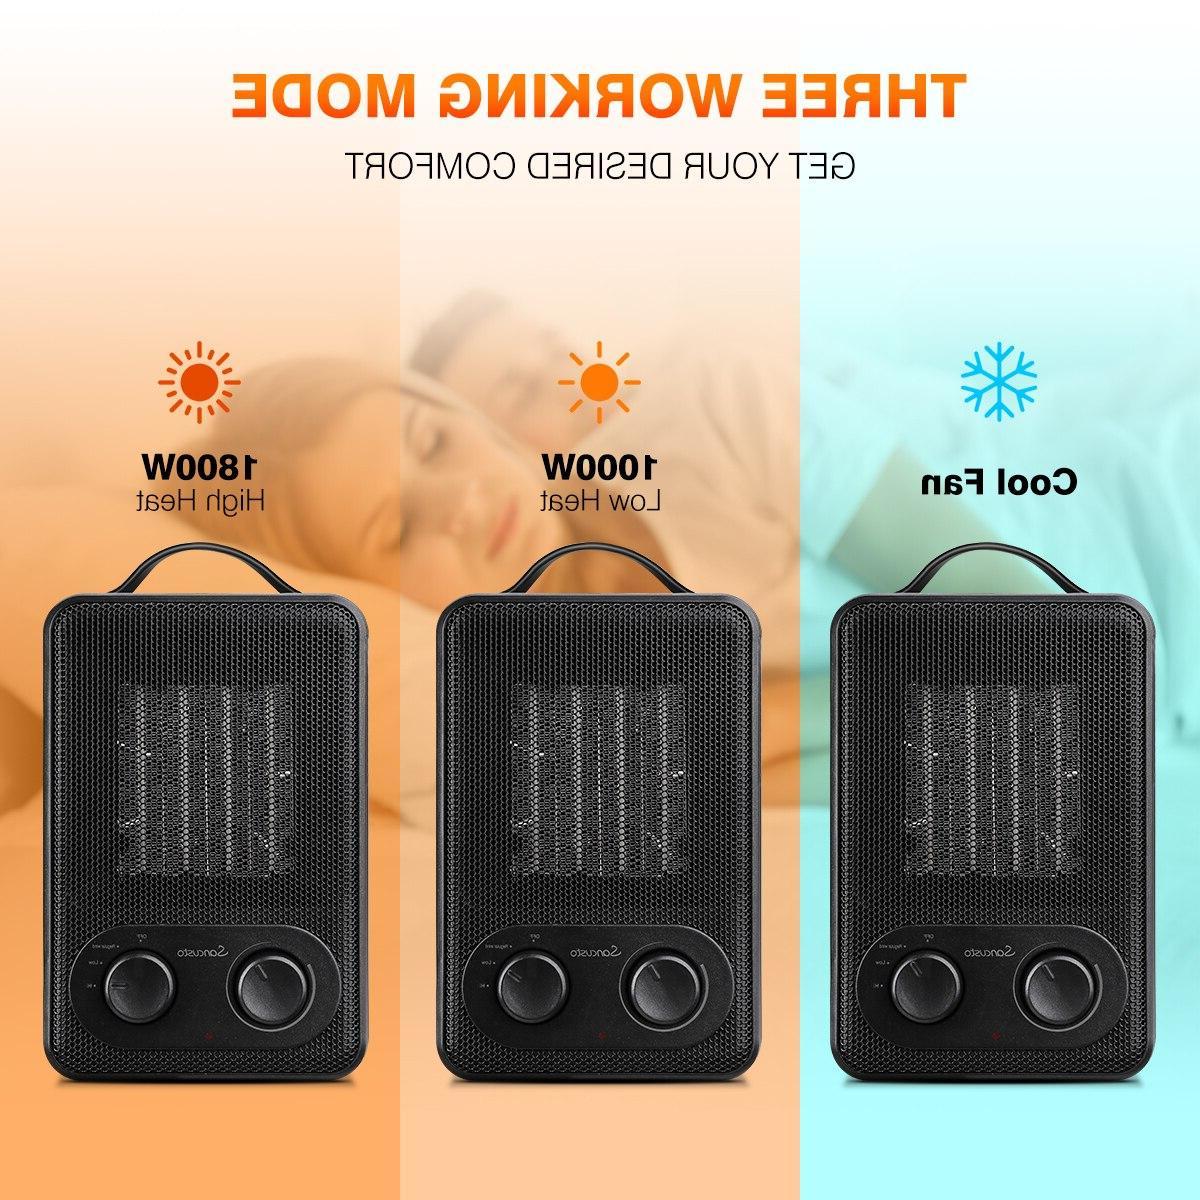 Sancusto DH-QN03 1800W Auto-Oscillation Overheating Carrying Perfect Home <font><b>Space</b></font> <font><b>Heater</b></font>